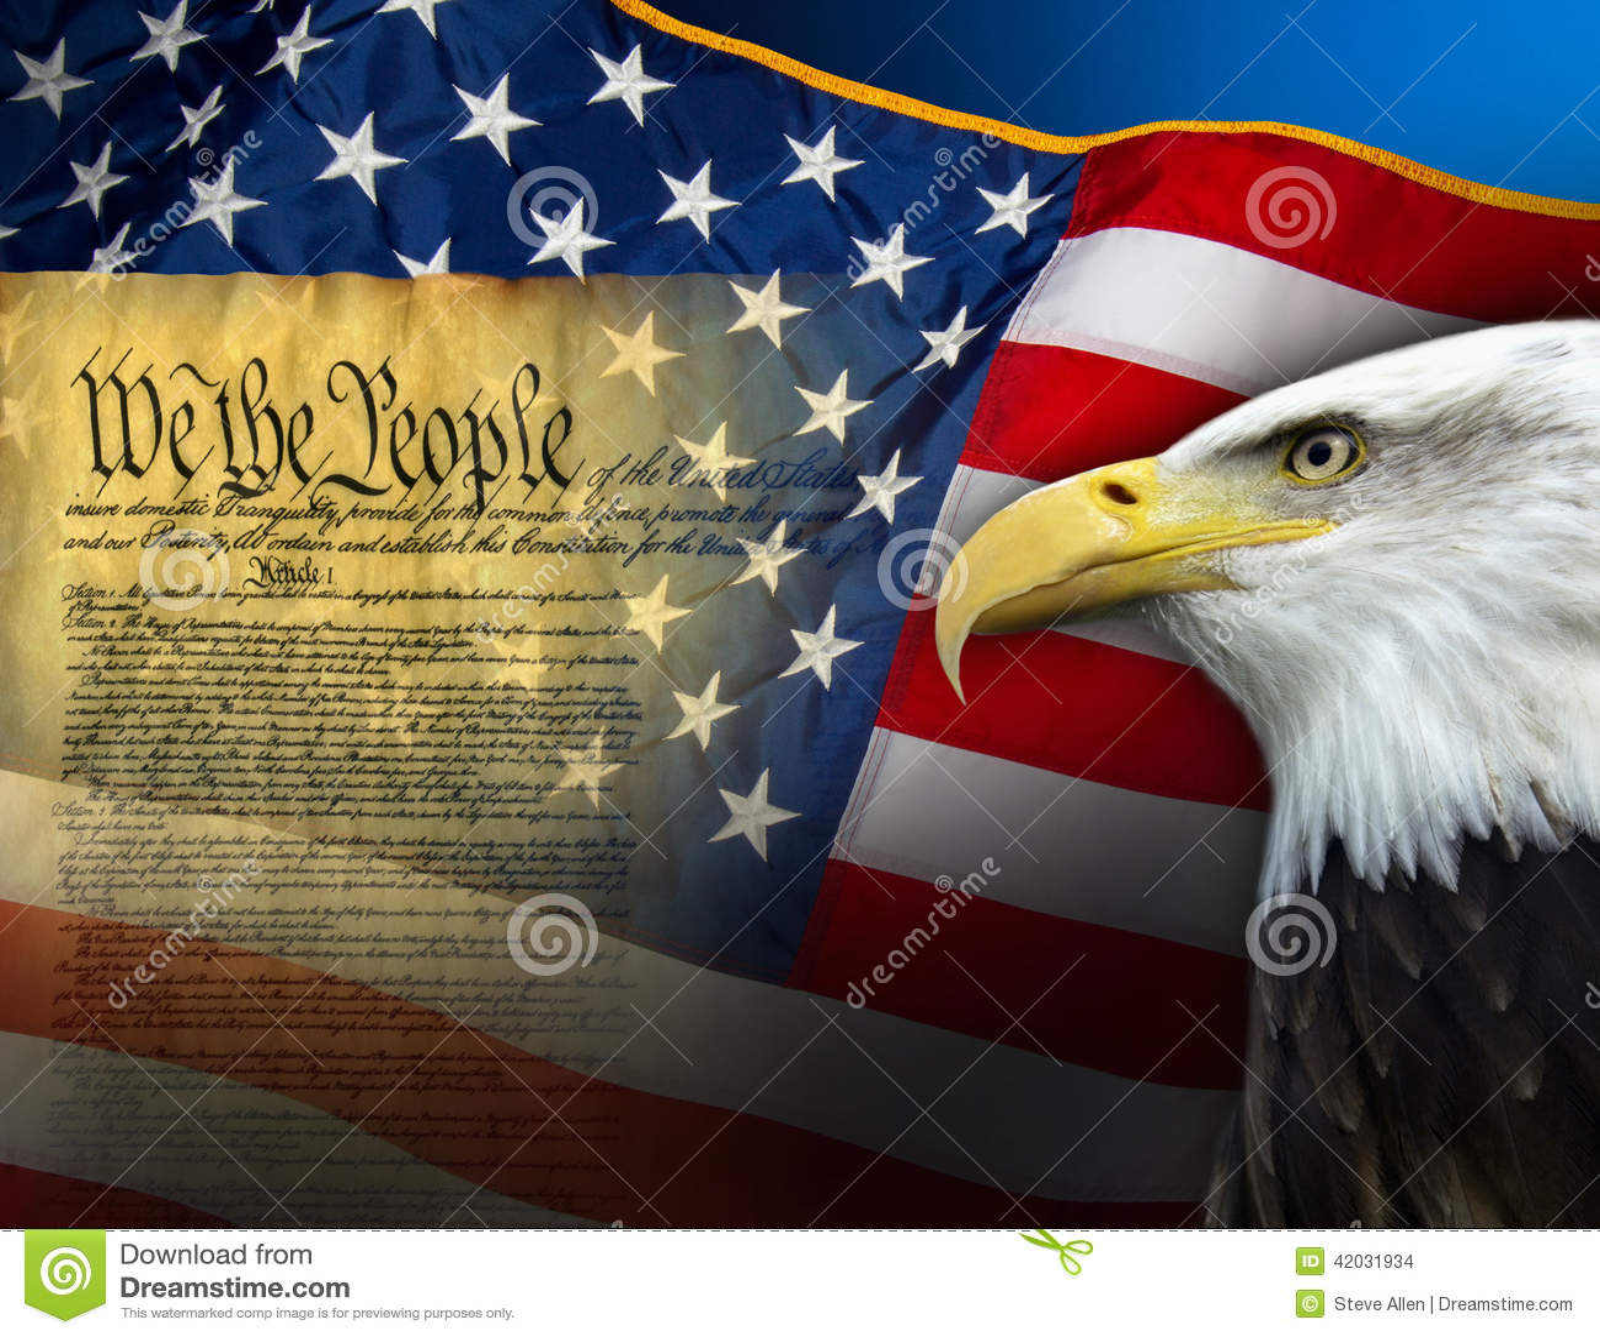 Patriotyczni symbole - Stany Zjednoczone Ameryka